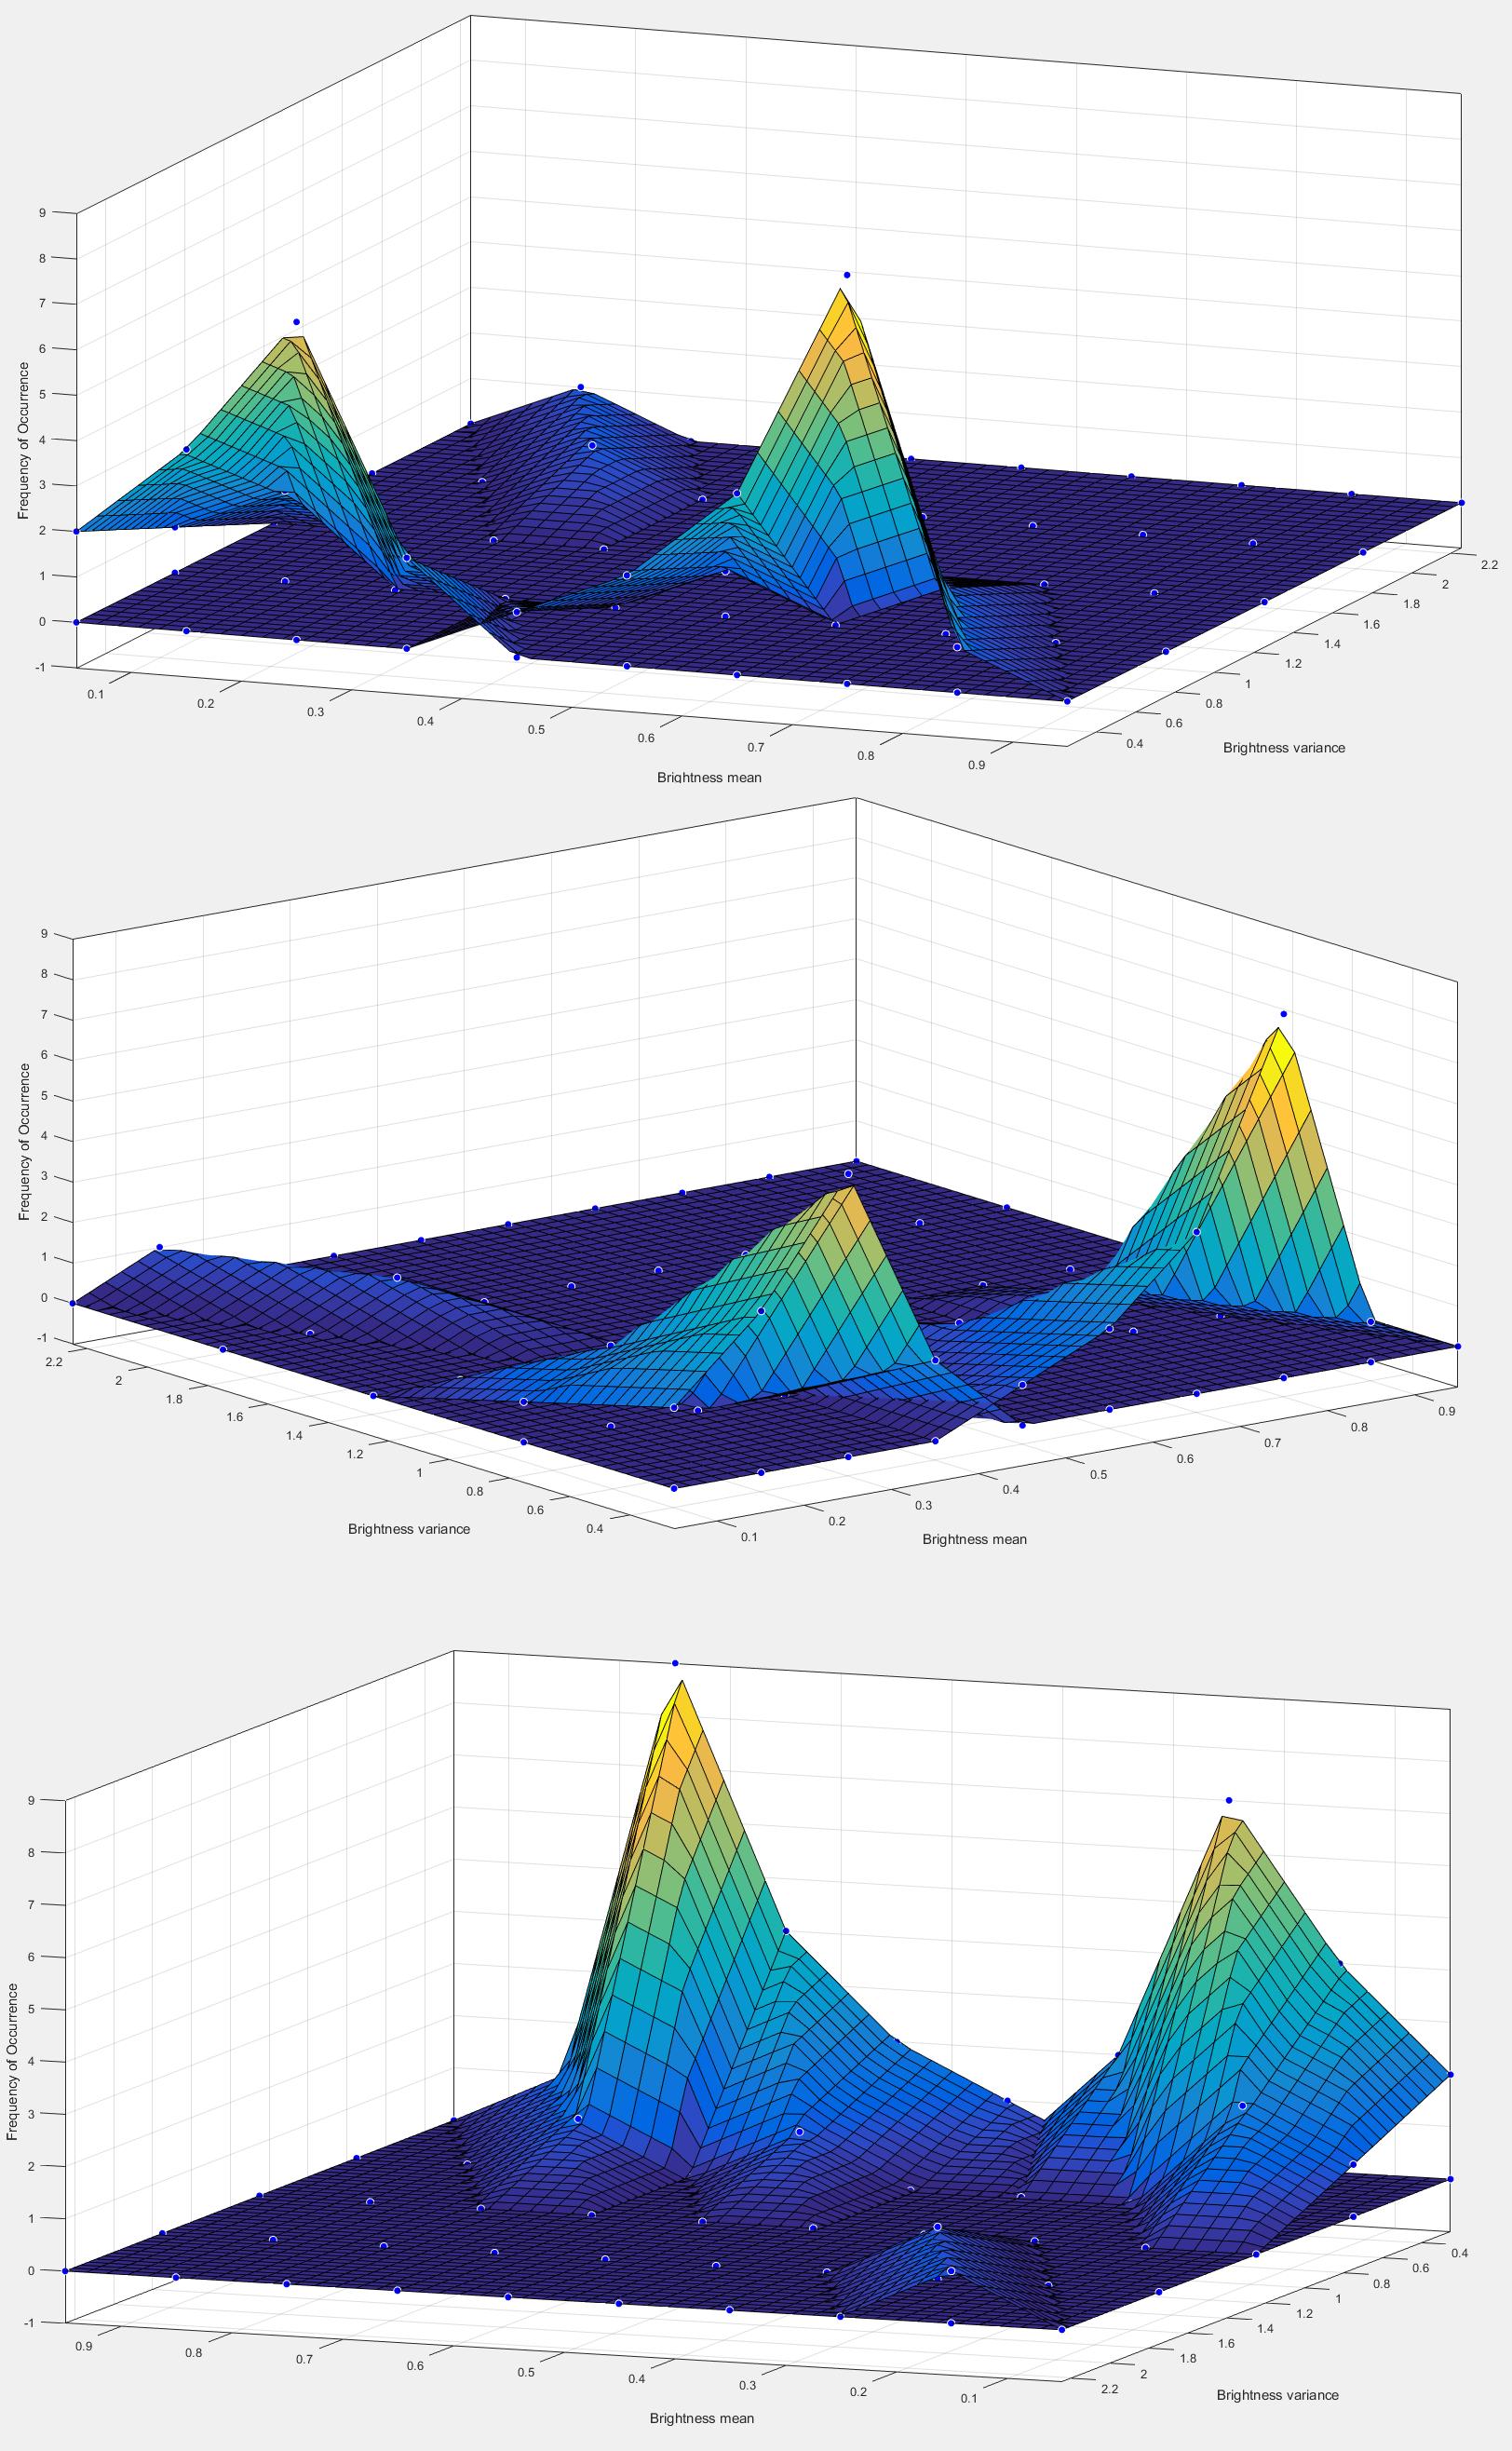 GitHub - TasoulasTheofanis/Bayes-Classifier-Images-Day-Night